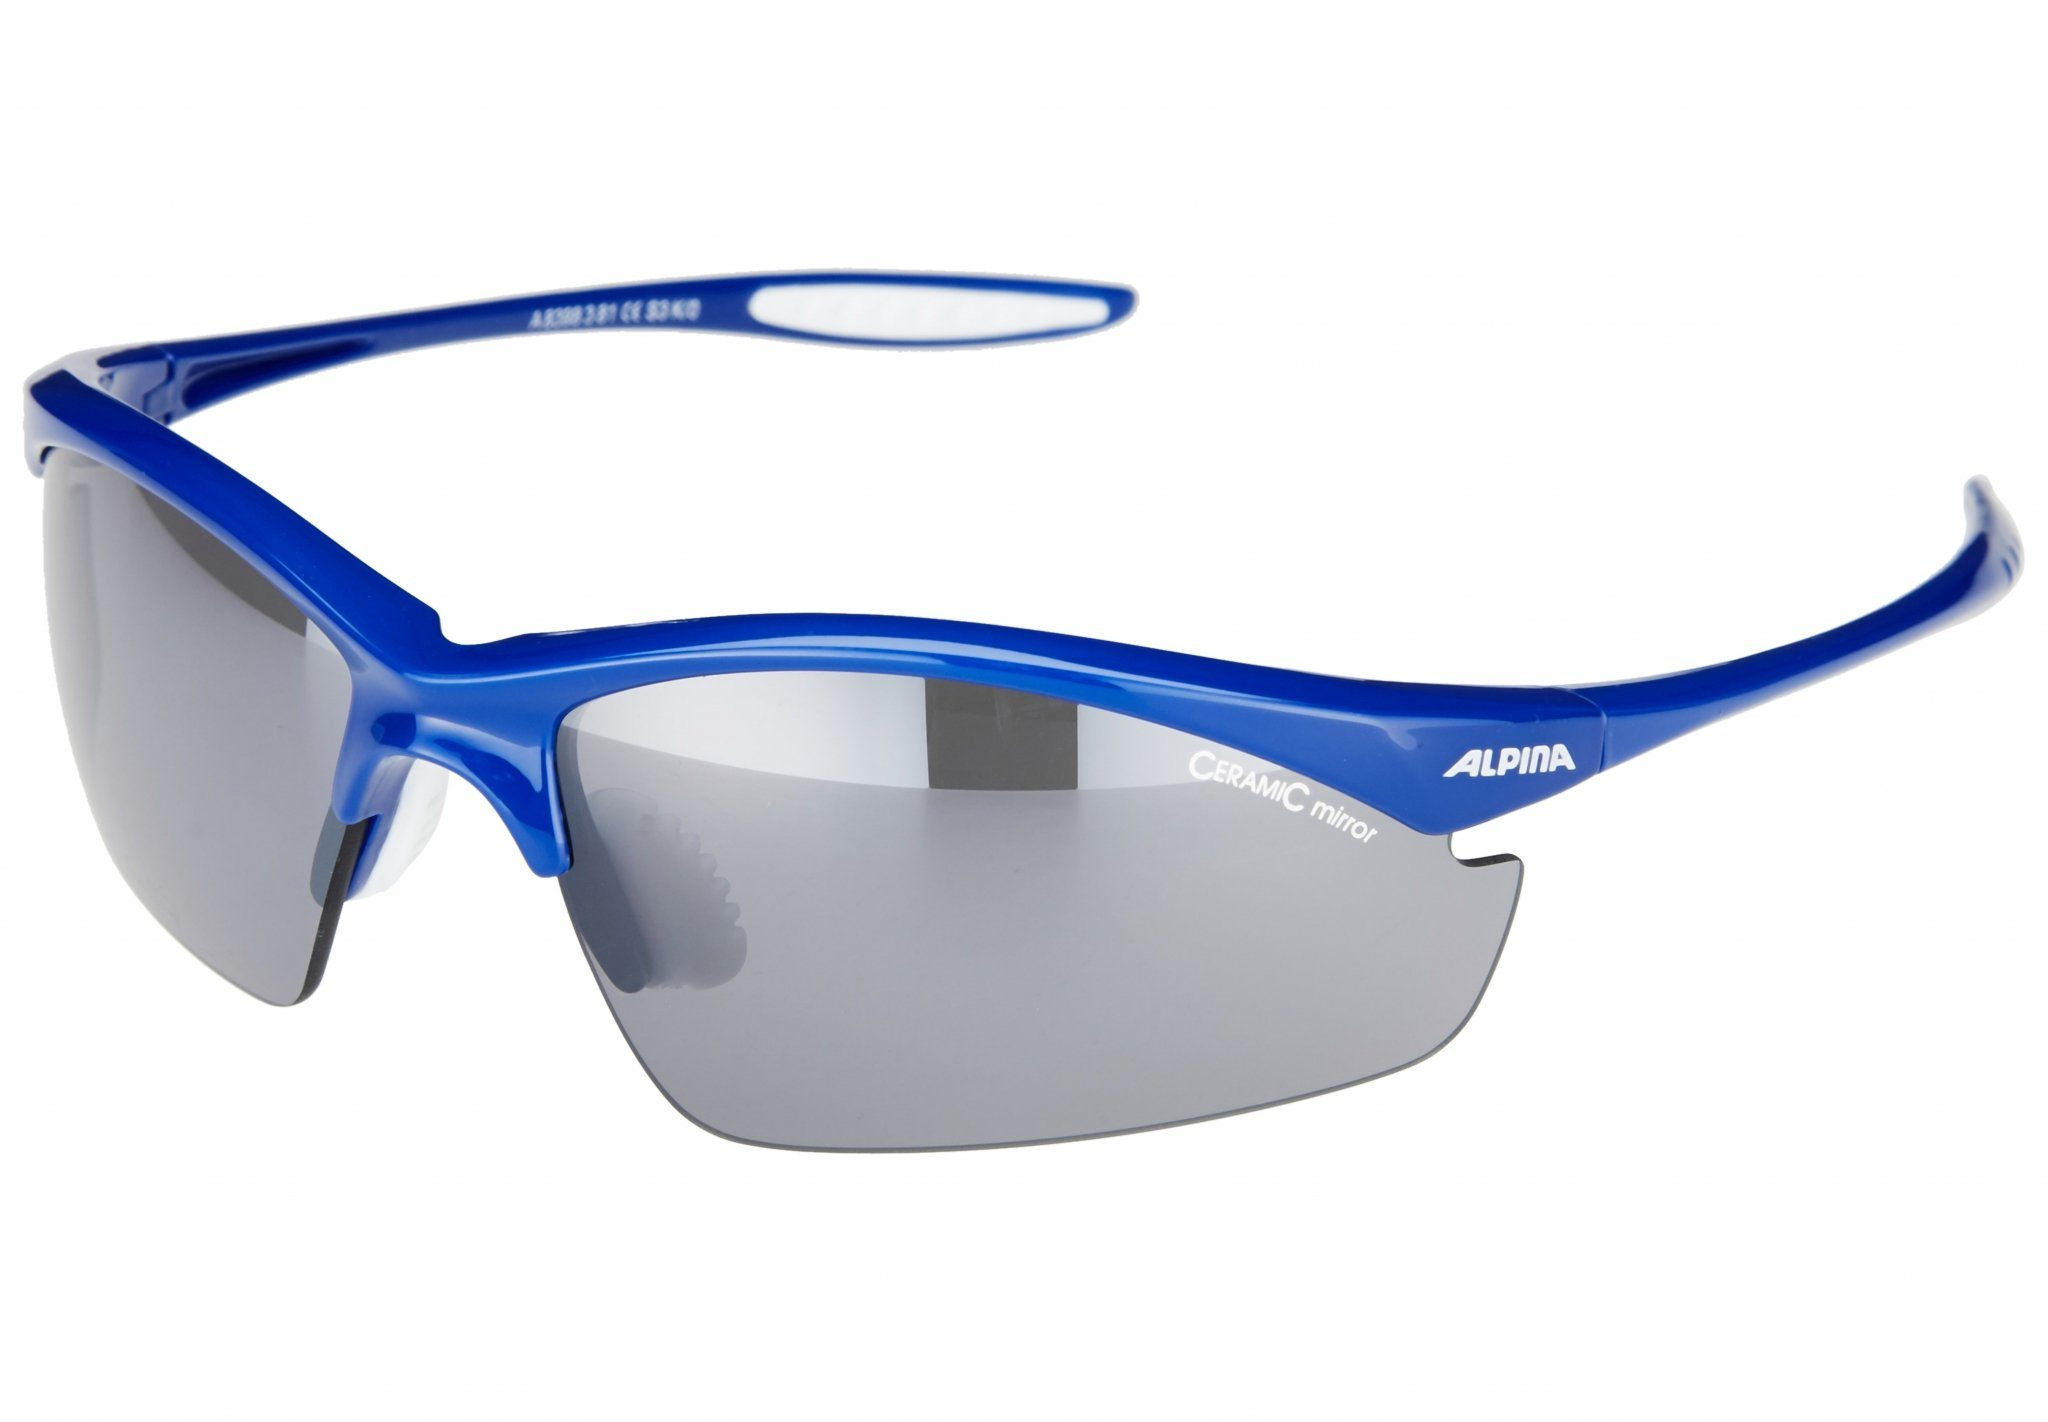 Alpina Radsportbrille »Tri-Effect Brille«